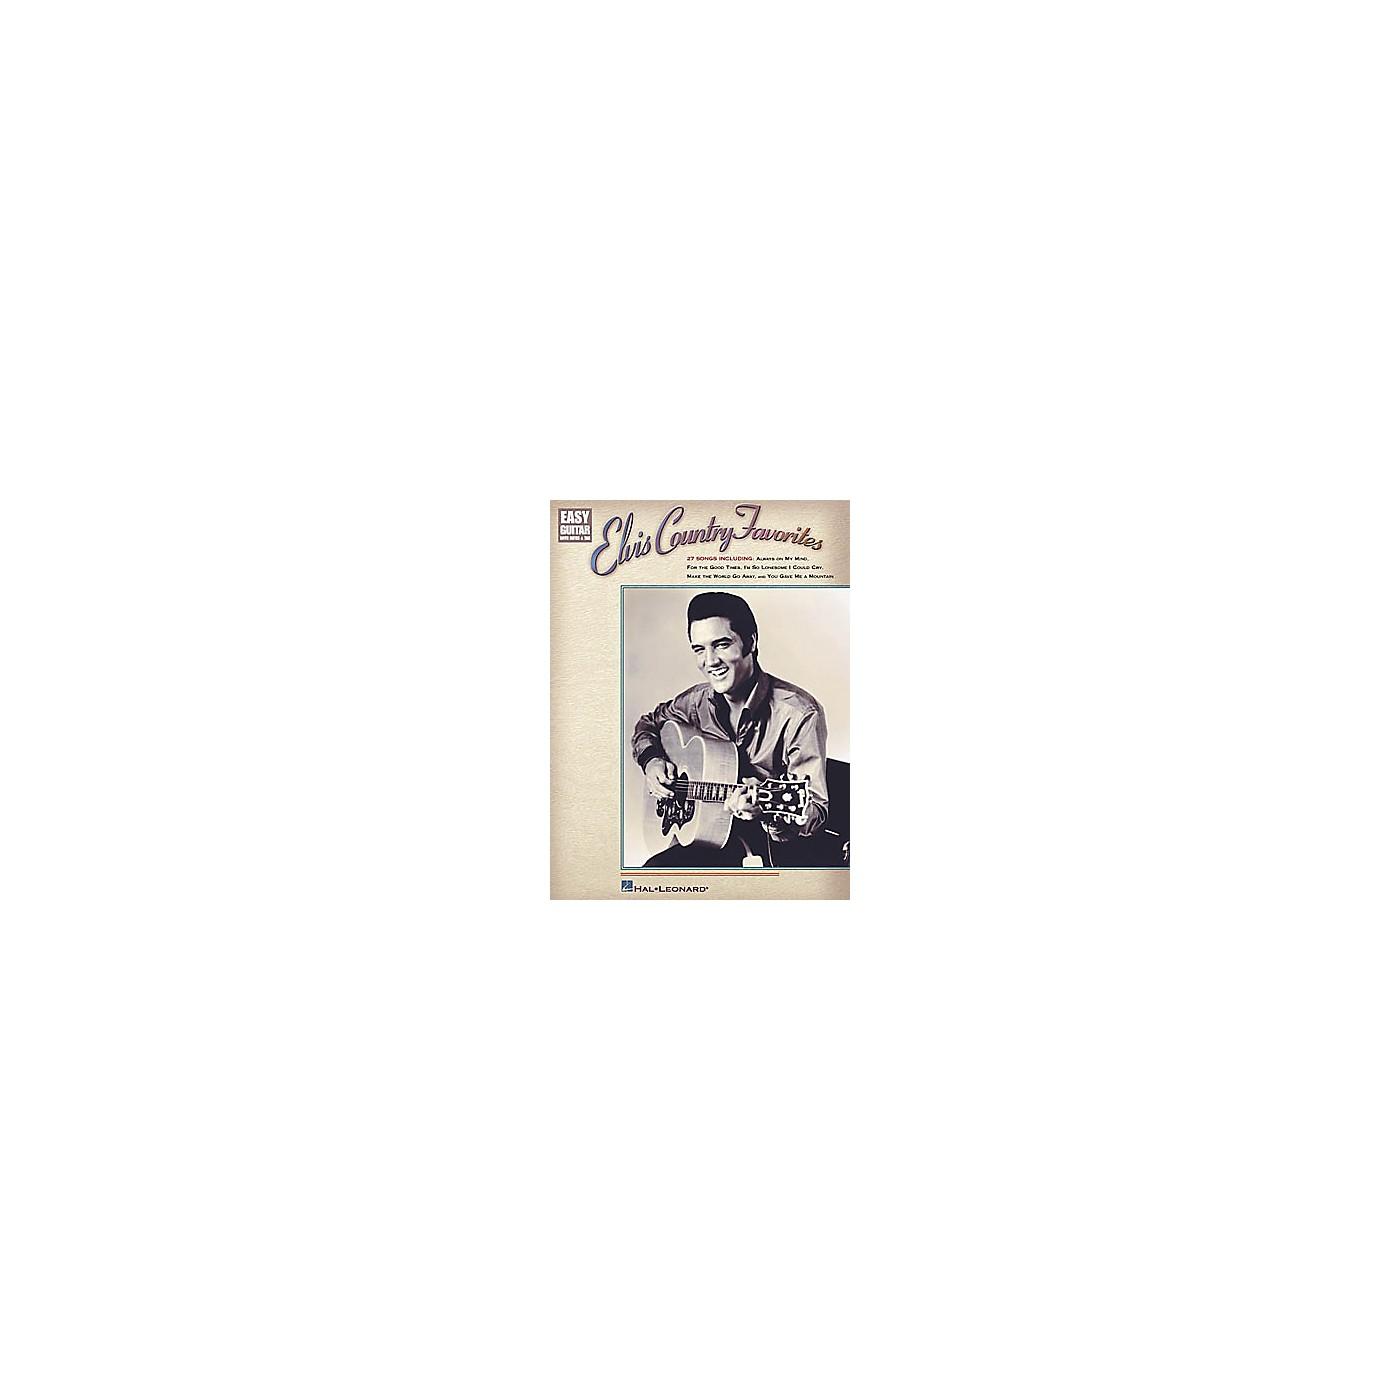 Hal Leonard Elvis Country Favorites Easy Guitar Book thumbnail